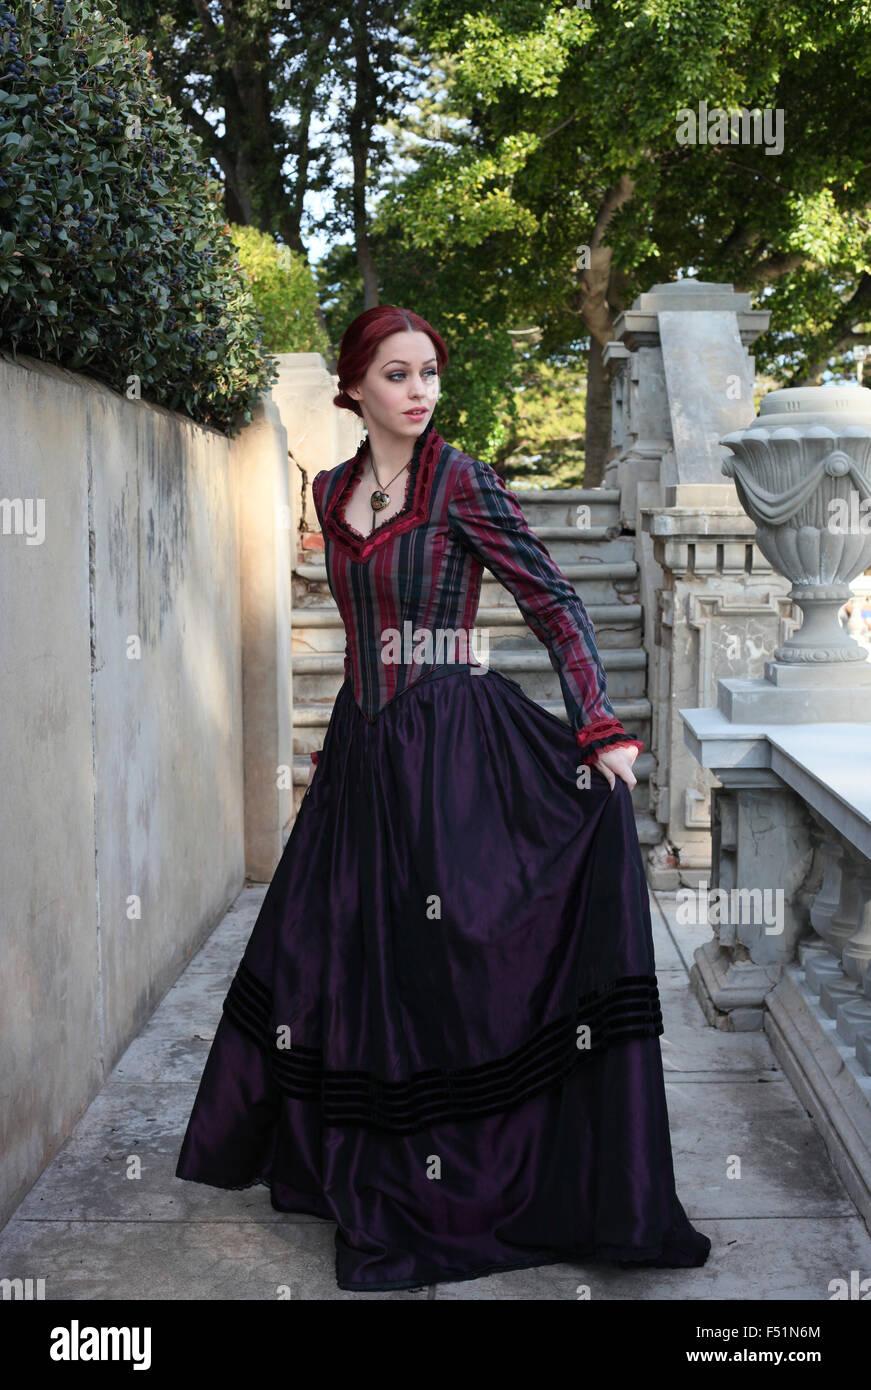 Old Fashioned Photo Vampire